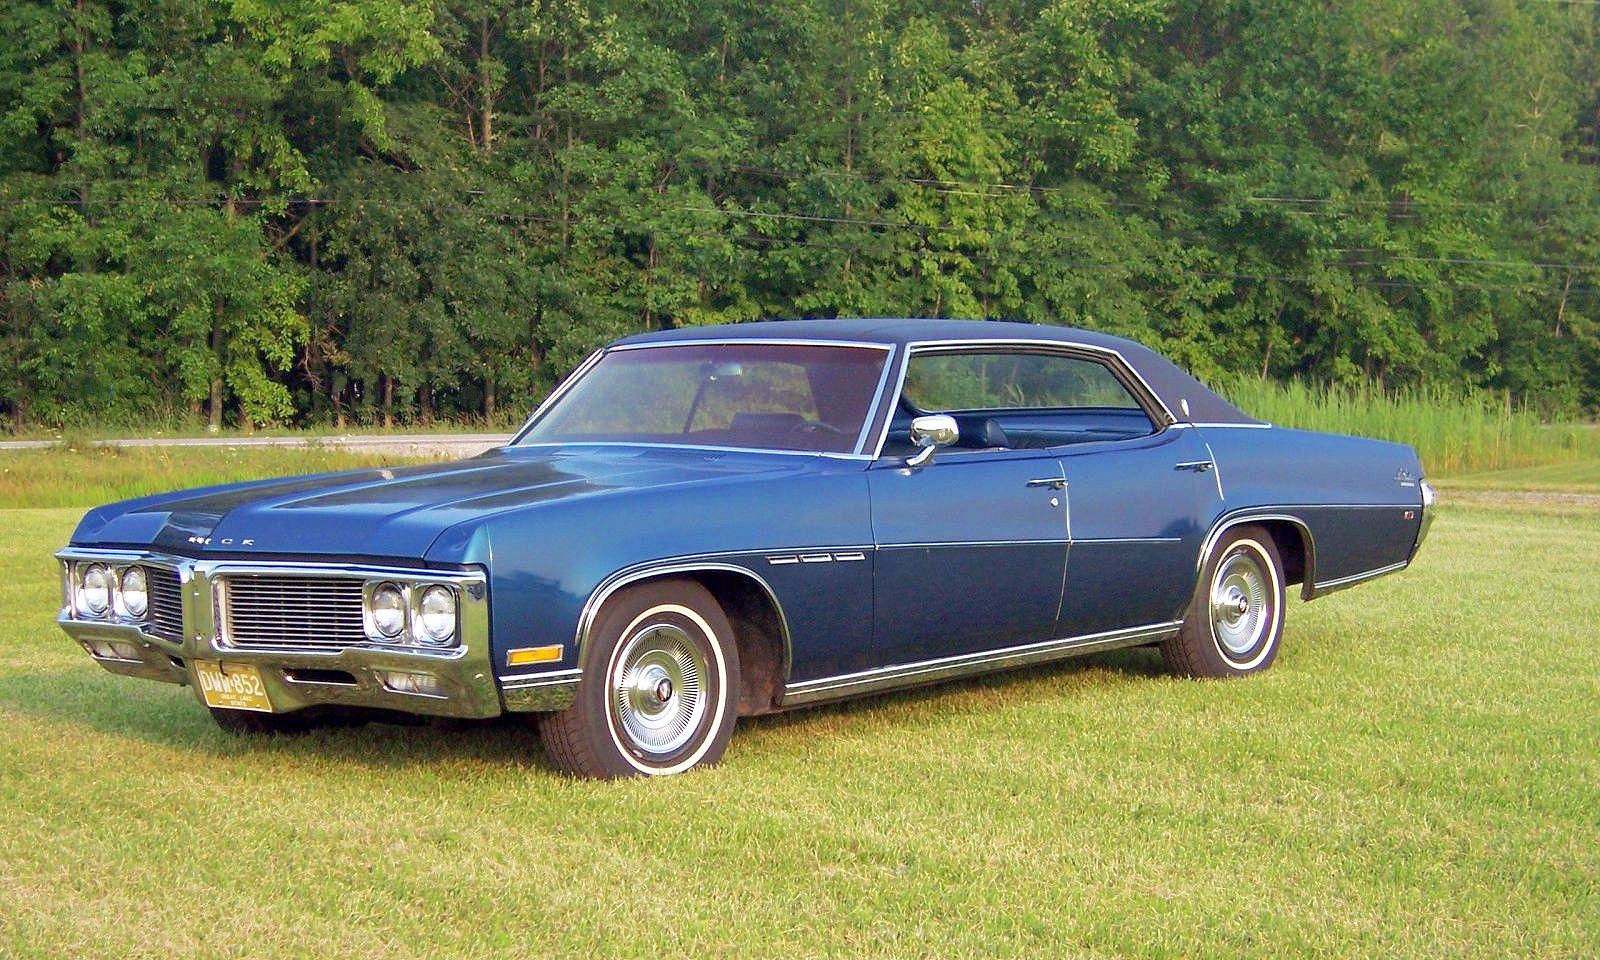 transpress nz: 1970 Buick LeSabre 4-door hardtop